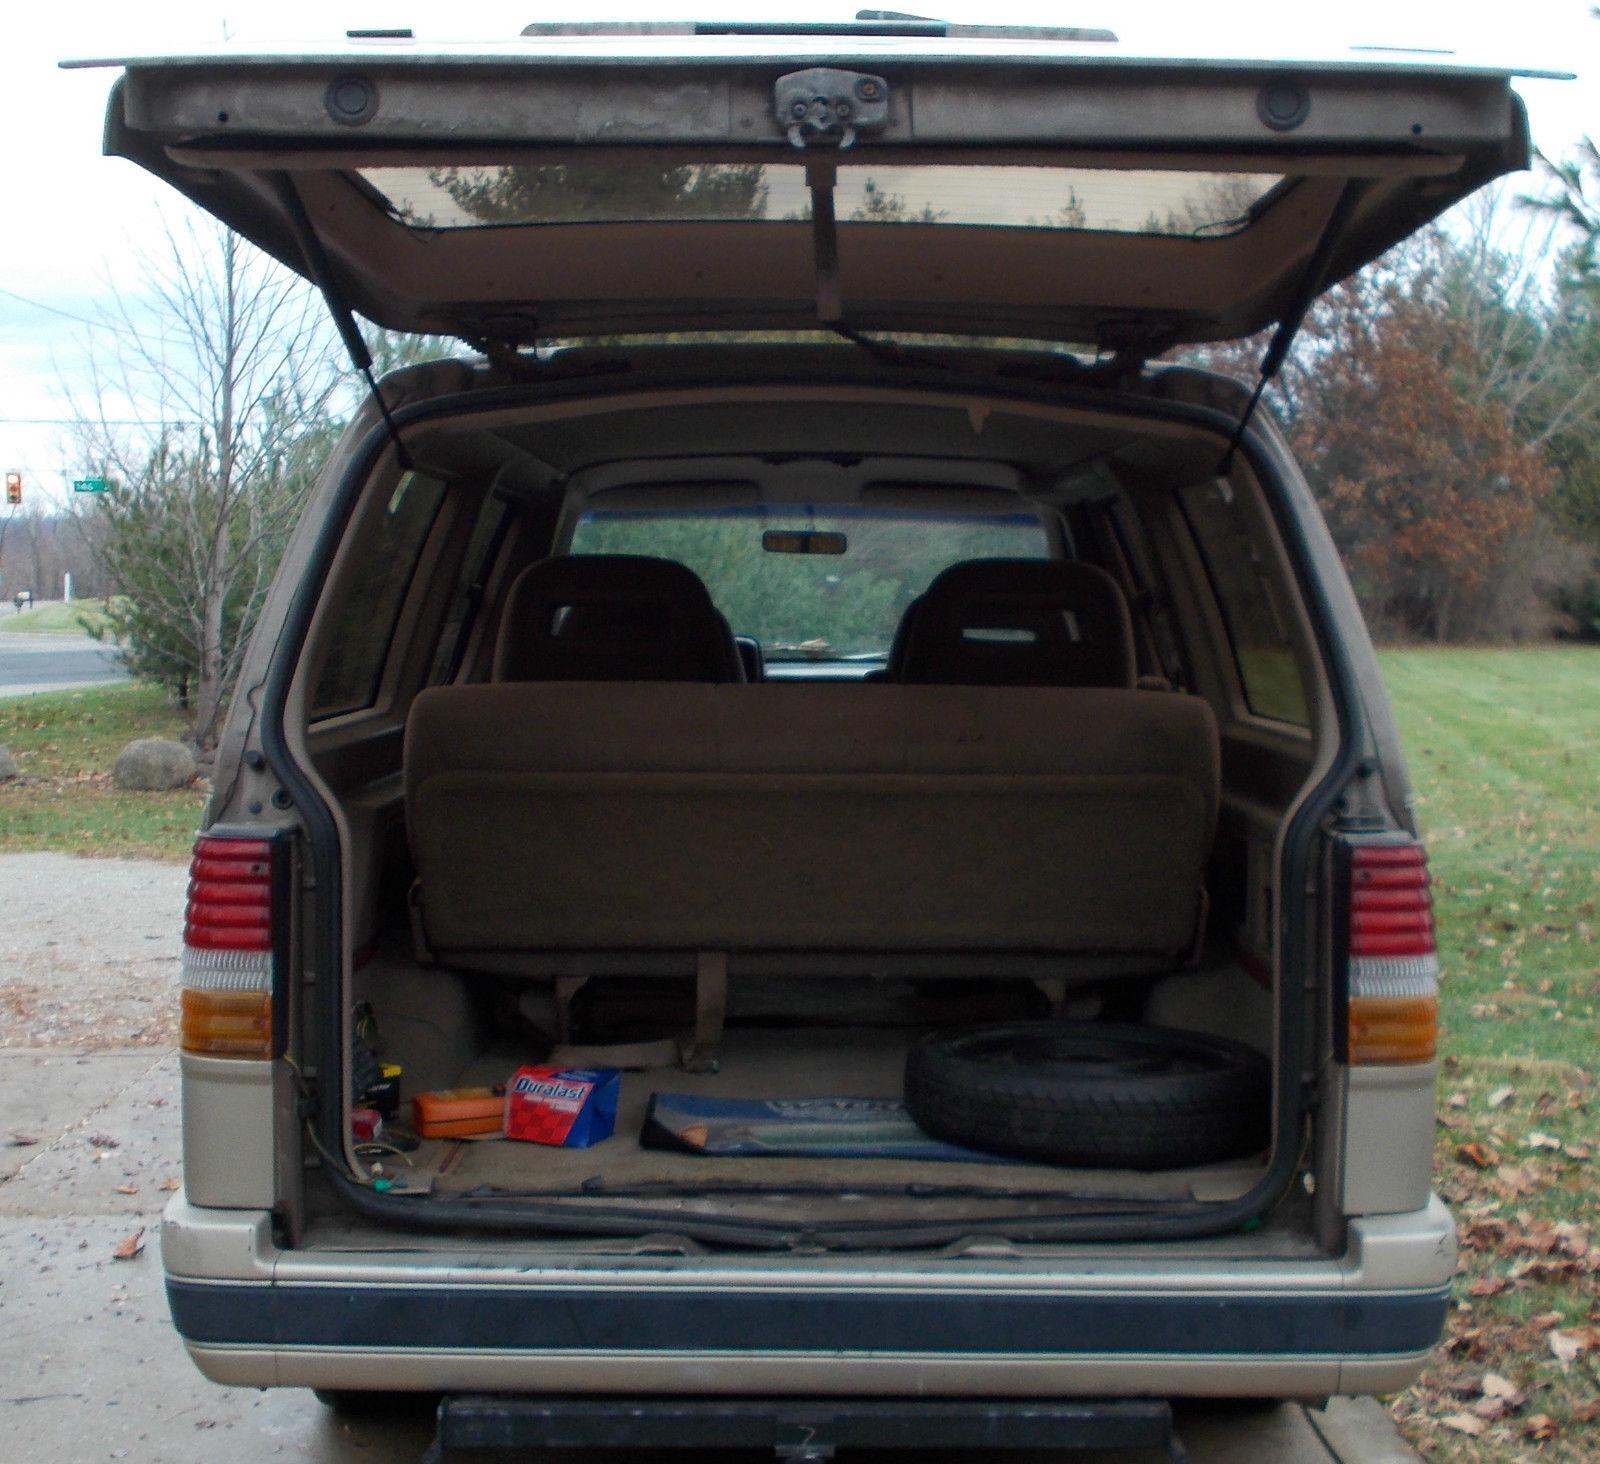 Used 2013 Ford Transit Connect Van Xlt For Sale In Yakima: 1991 Ford Aerostar Base Mini Passenger Van 2-Door 3.0L